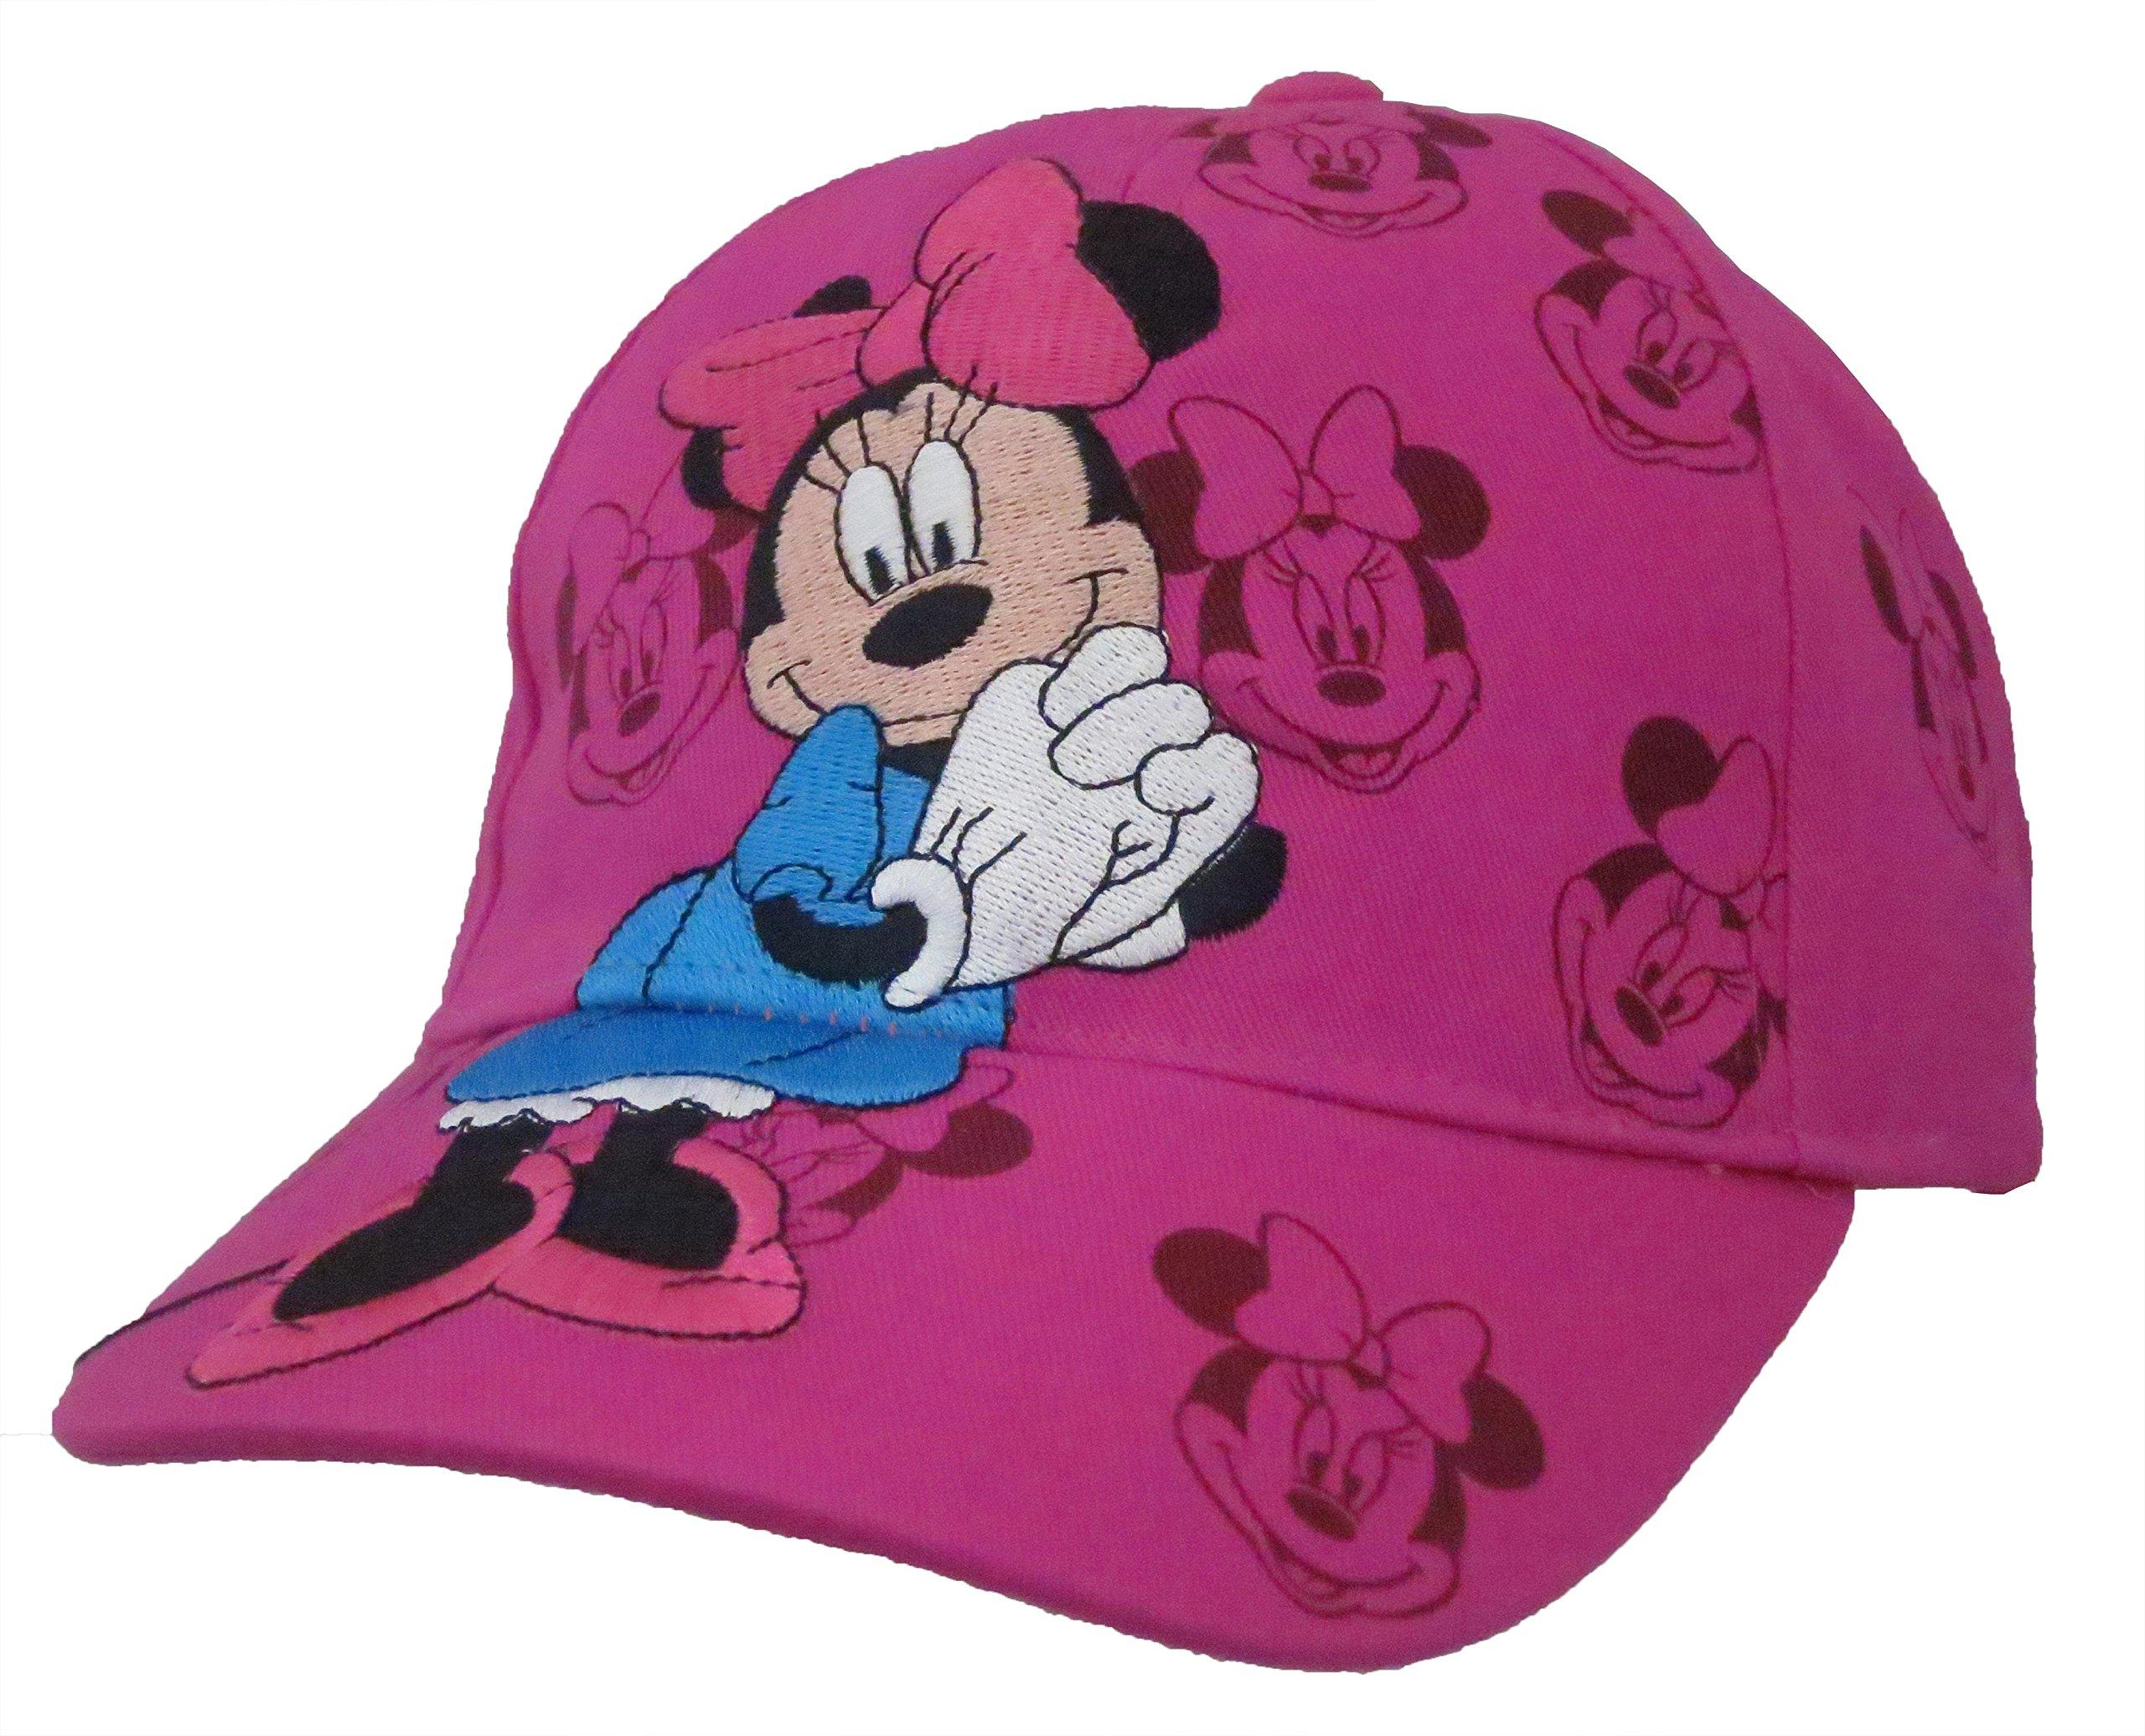 Disney Minnie Mouse Faces Girls Baseball Cap [2013]